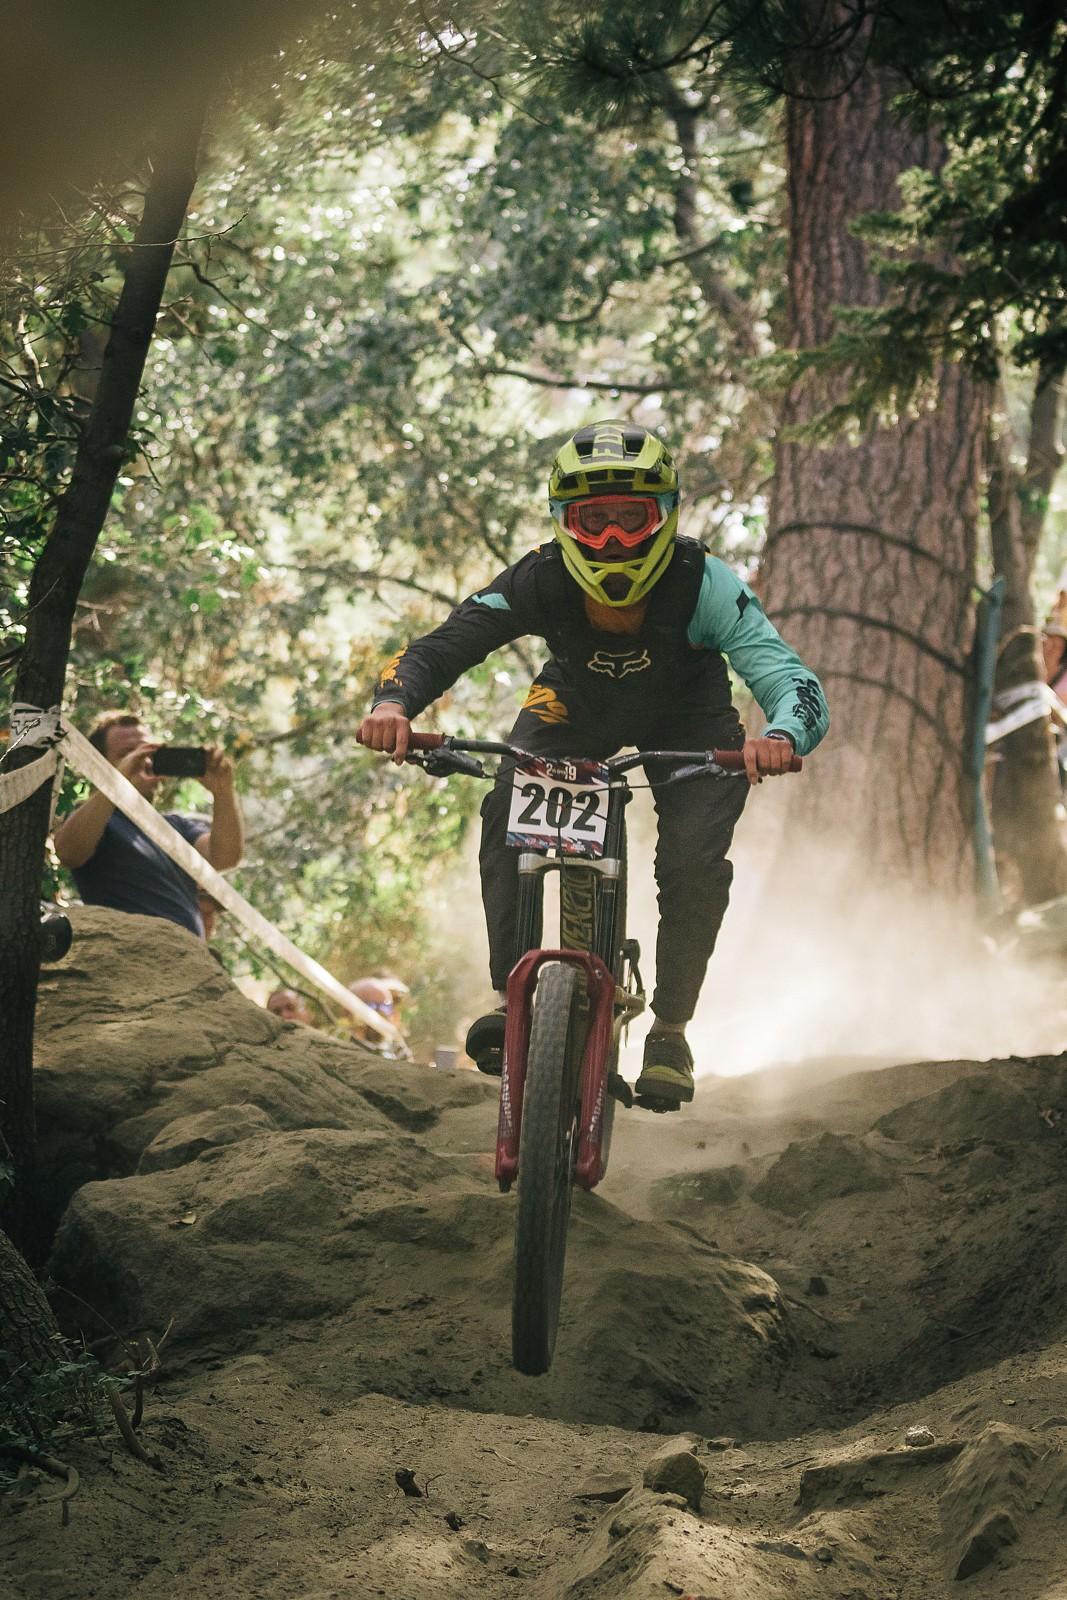 2019USOpenMTB DH yellow-24 - ALeedomPhotography - Mountain Biking Pictures - Vital MTB